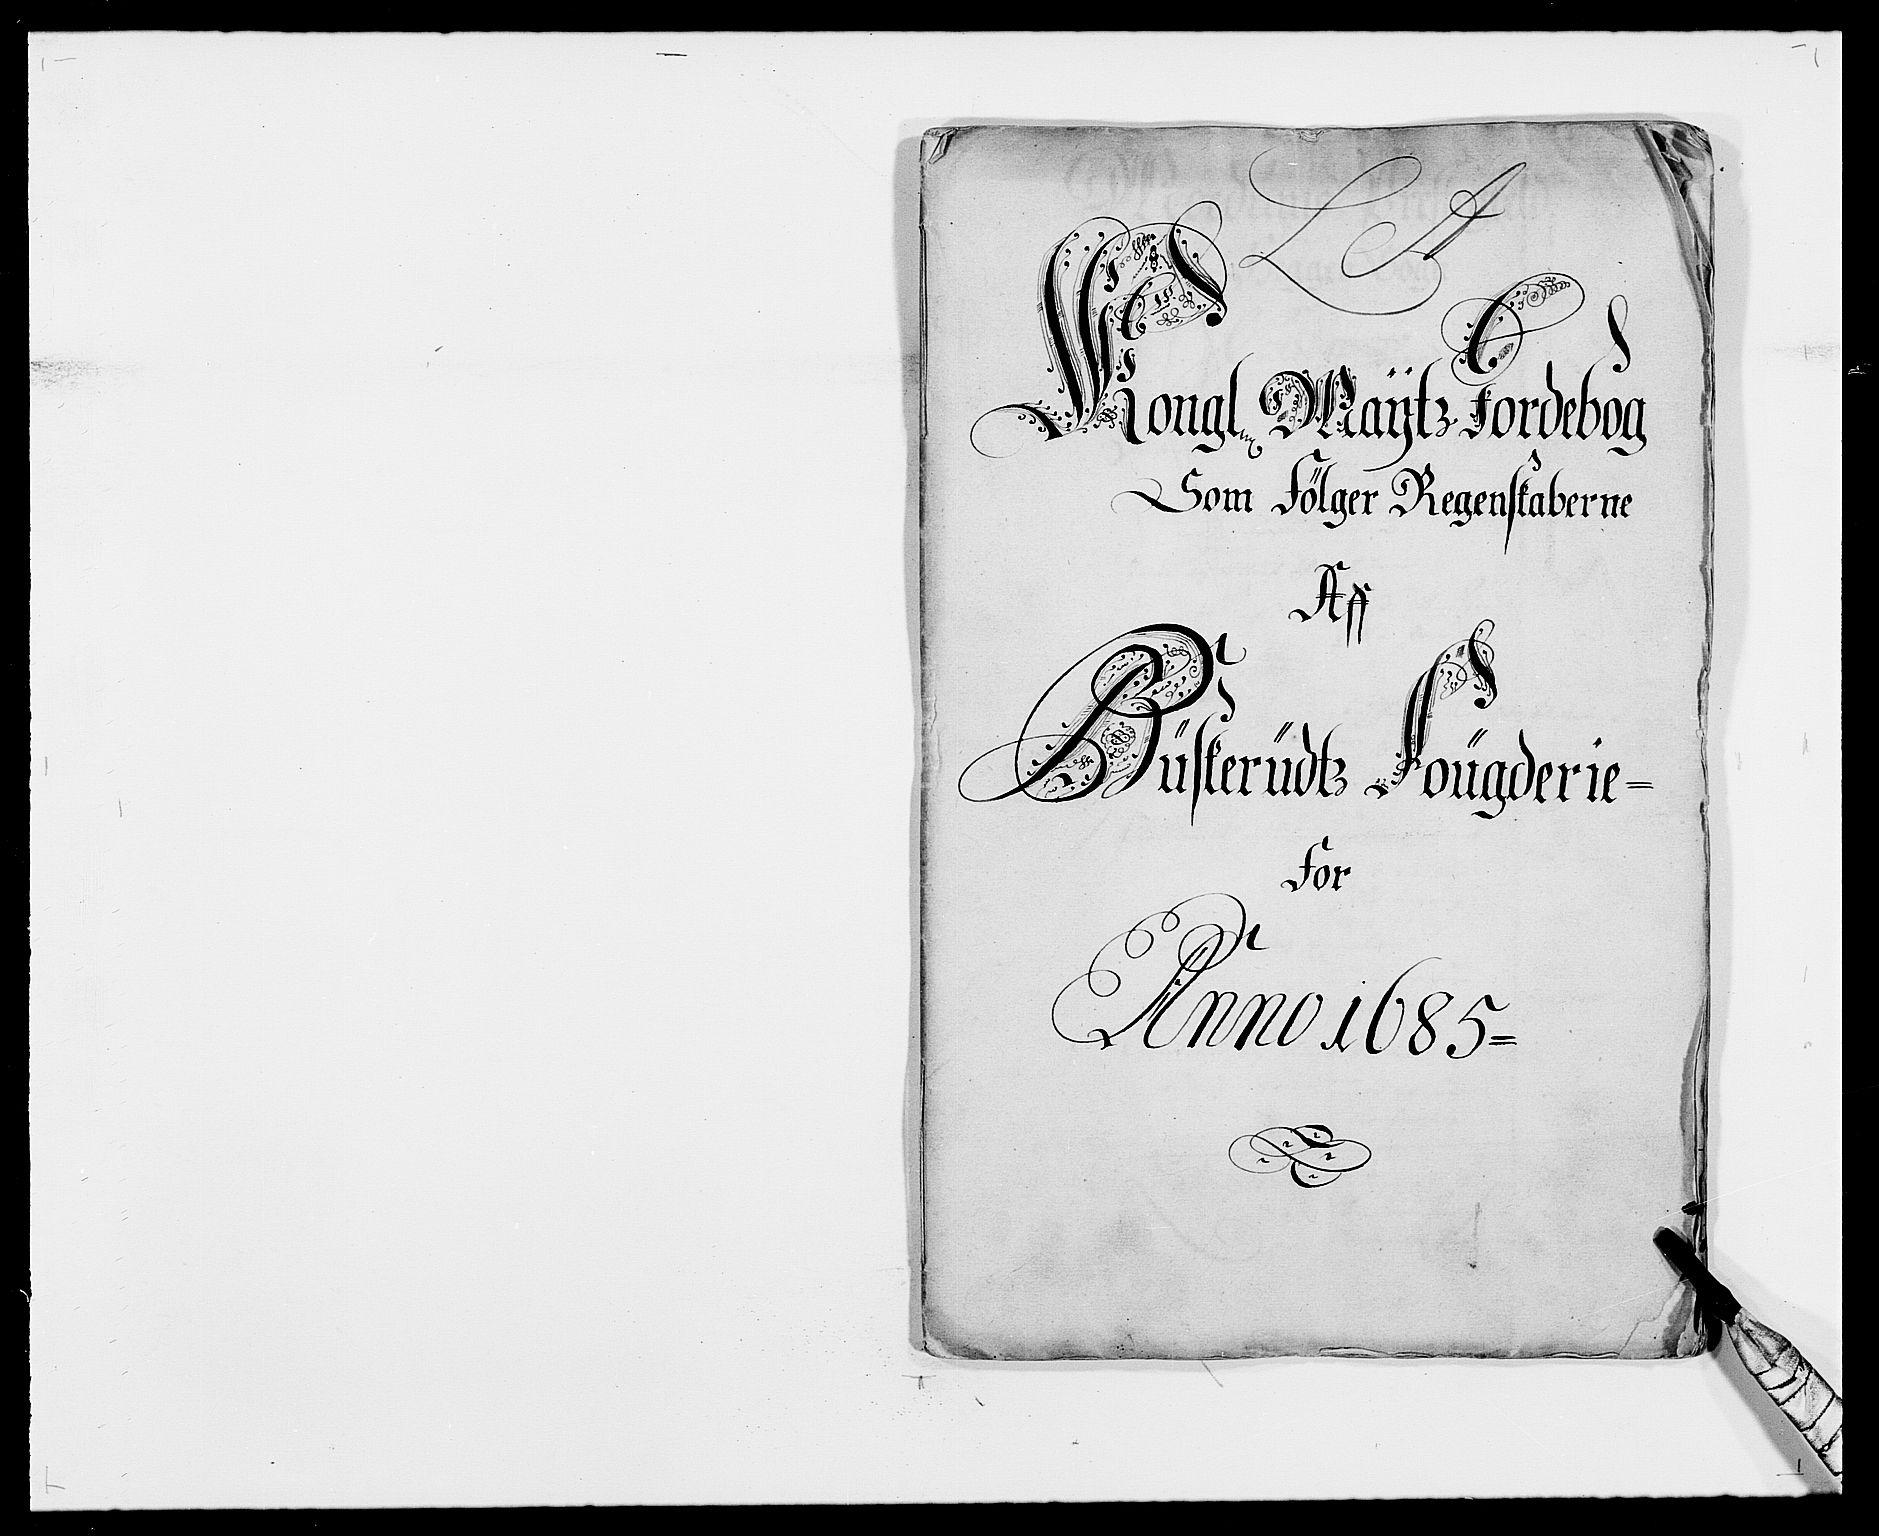 RA, Rentekammeret inntil 1814, Reviderte regnskaper, Fogderegnskap, R25/L1678: Fogderegnskap Buskerud, 1685-1686, s. 2